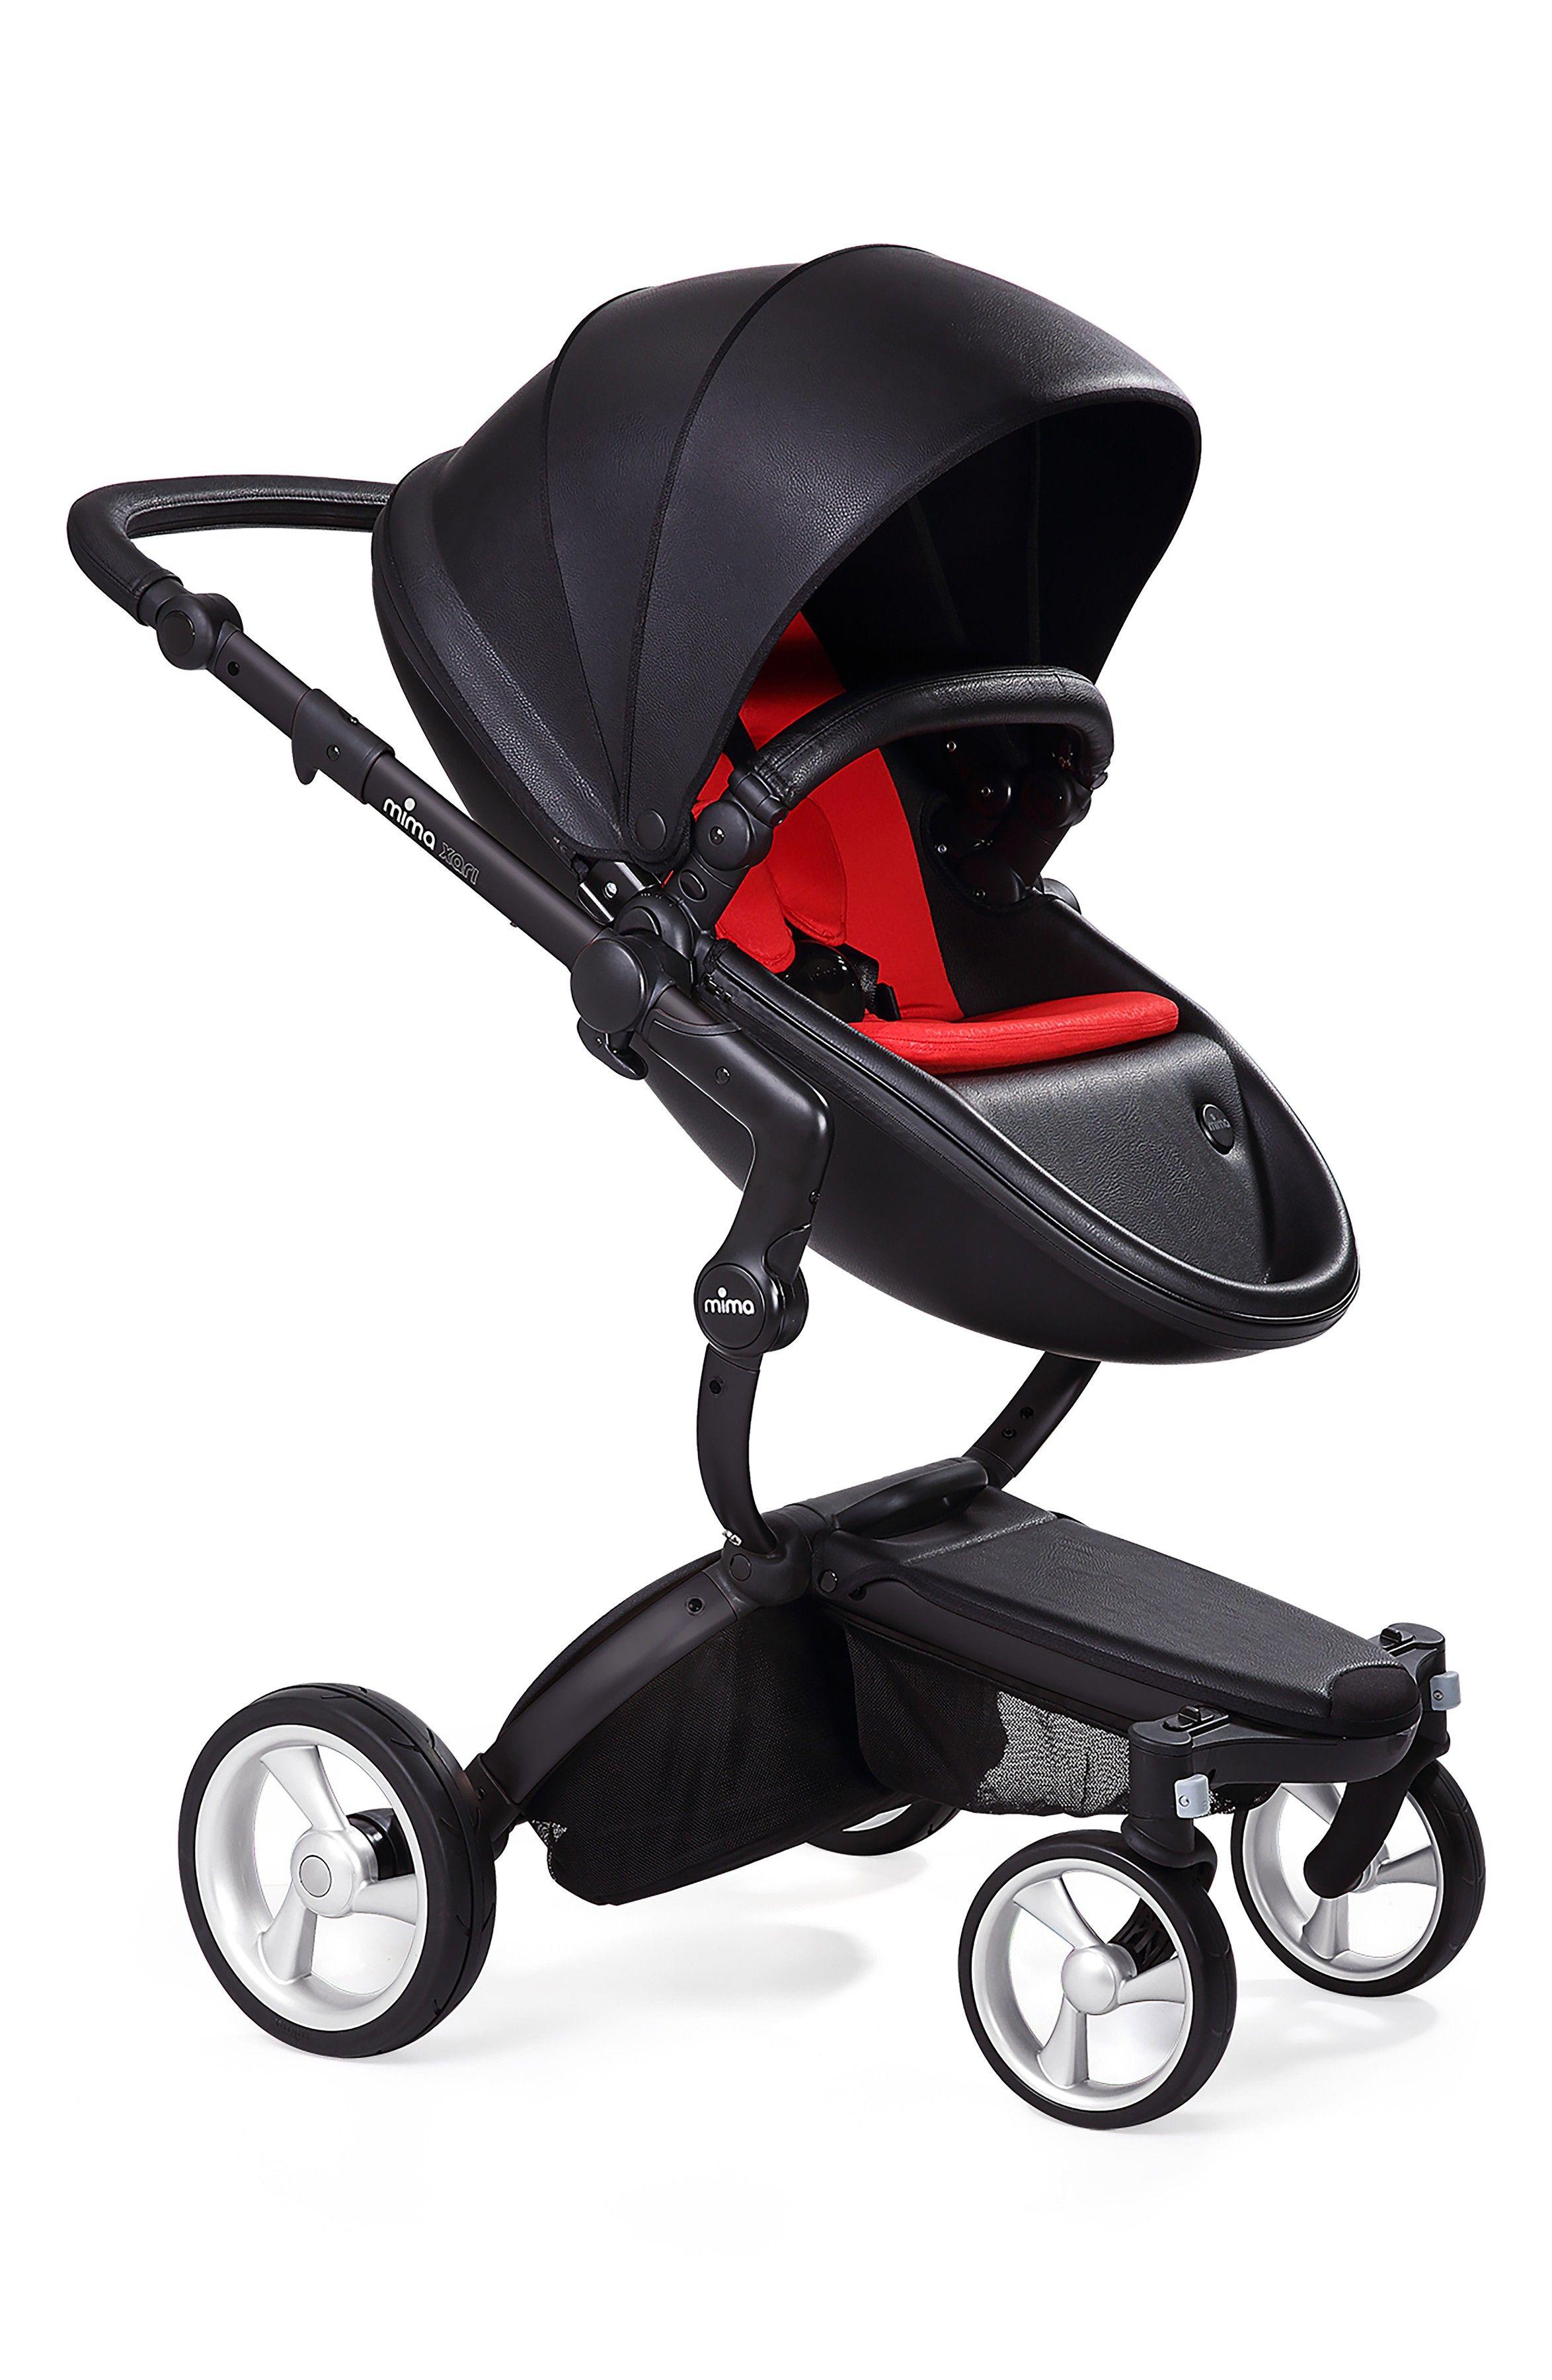 Main Image - Mima Xari Black Frame Stroller with Reversible ...